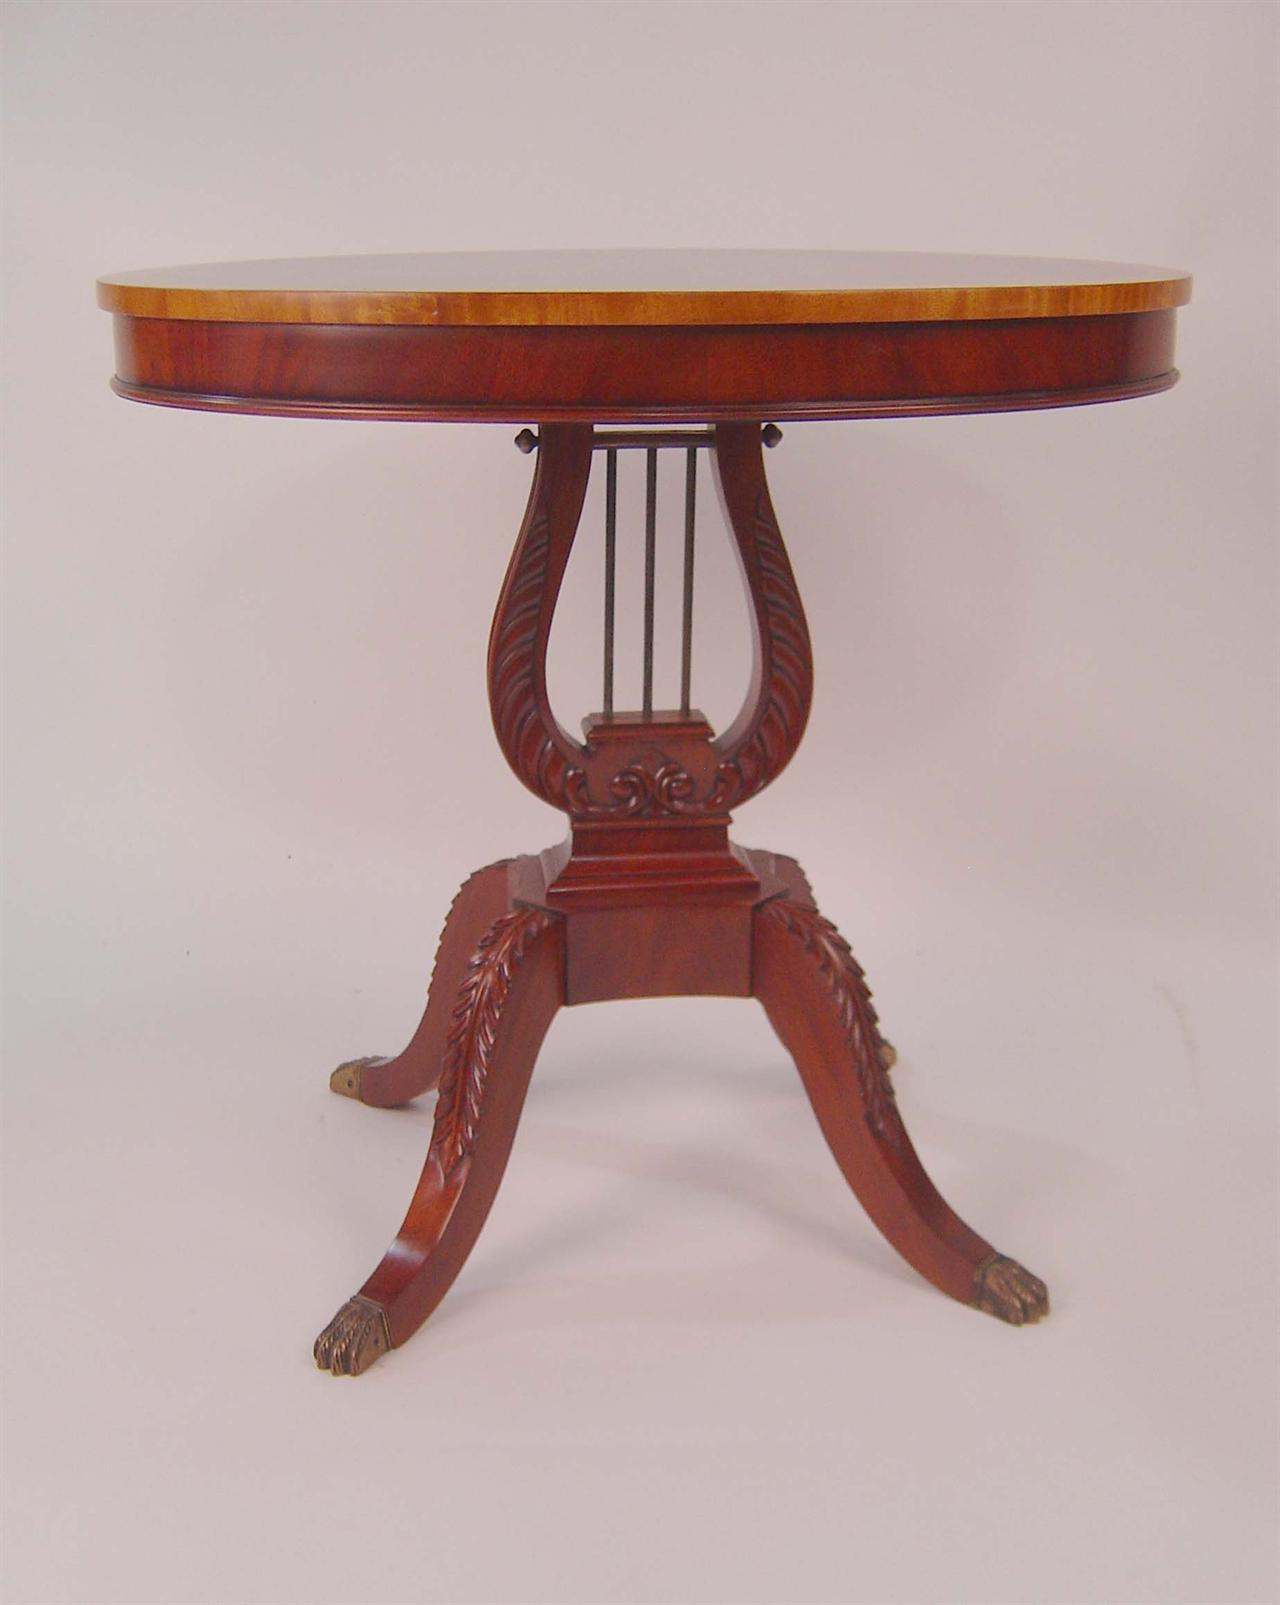 Mahogany 32 inch Diameter Duncan Phyfe End Table : lyre based lamp table 2587 from antiquepurveyor.com size 1280 x 1605 jpeg 89kB